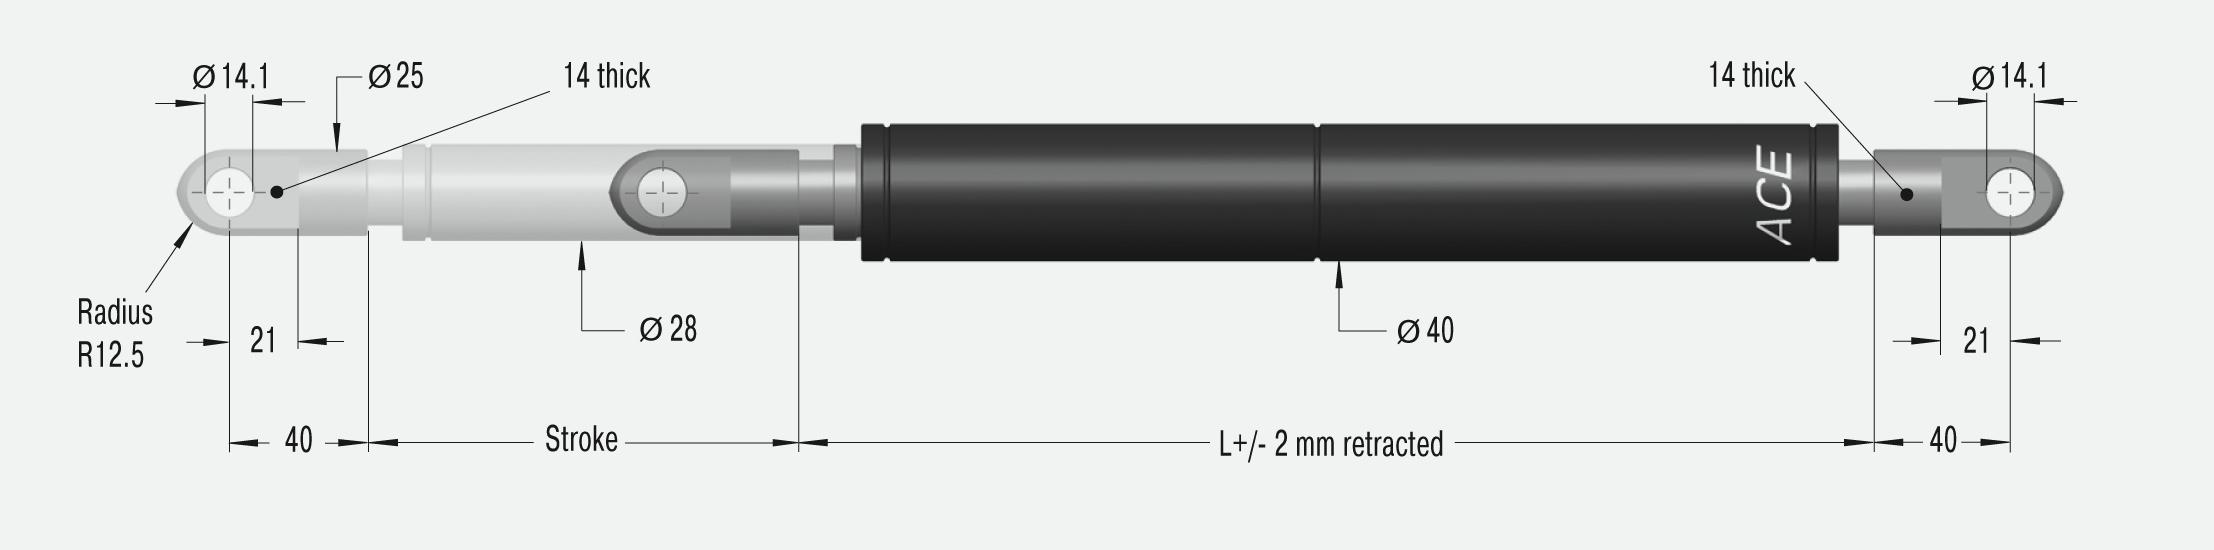 GZ-40-250